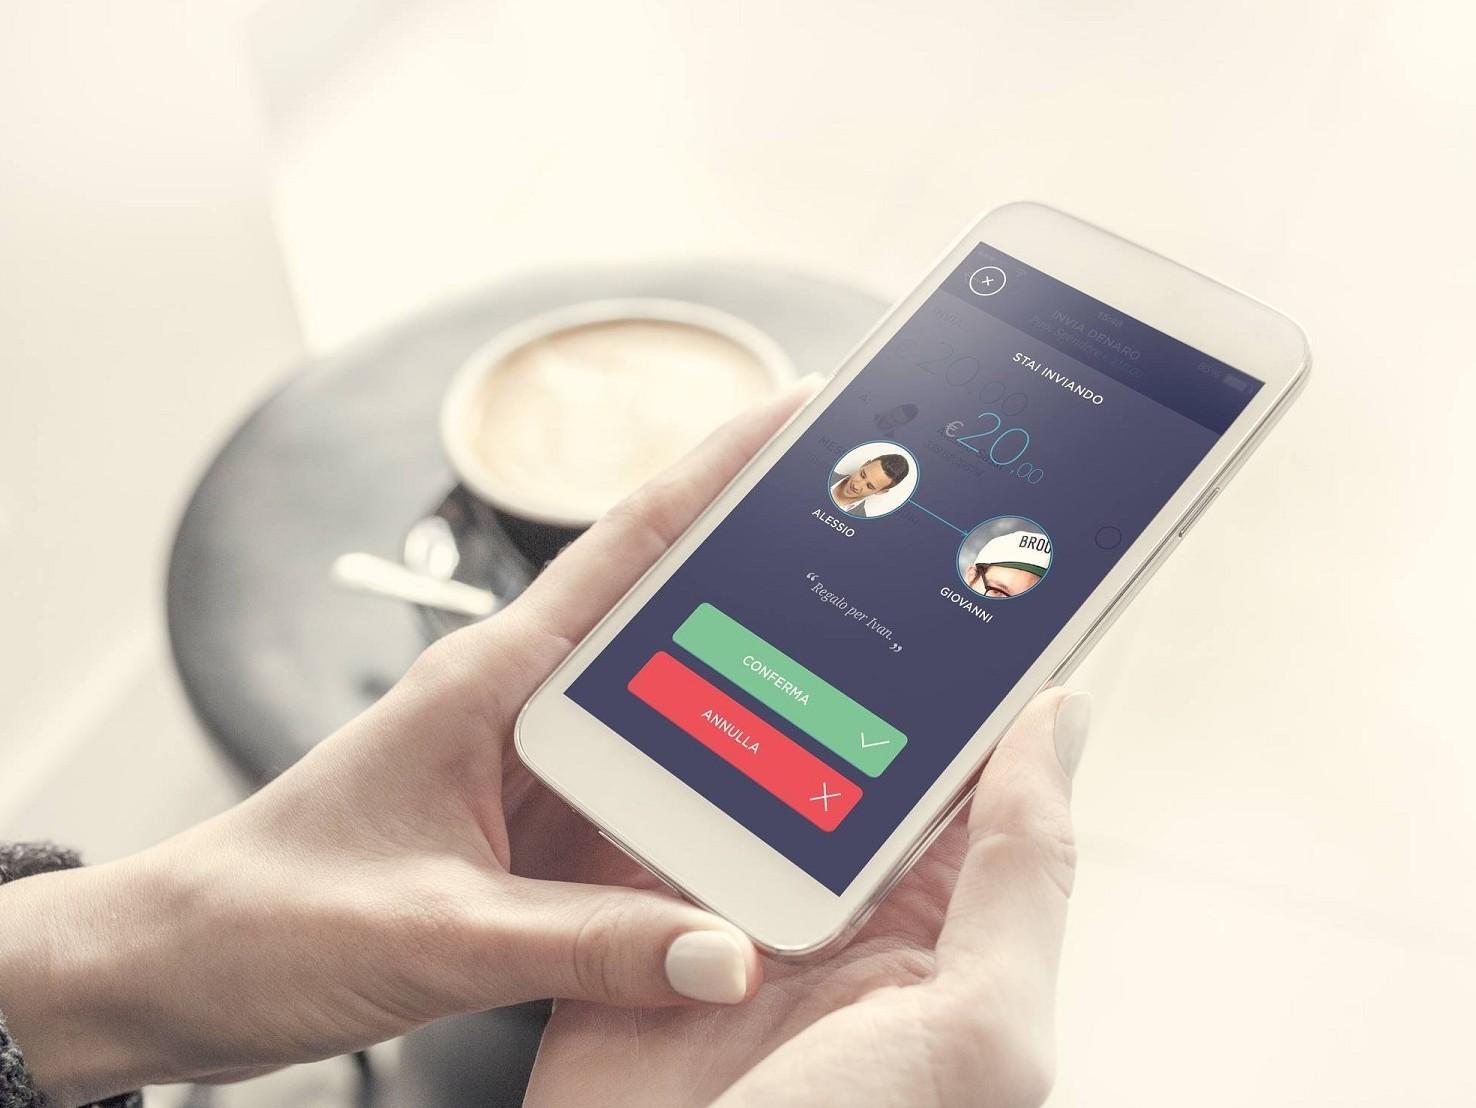 Apple Pay e Google Wallet: sicurezza, di